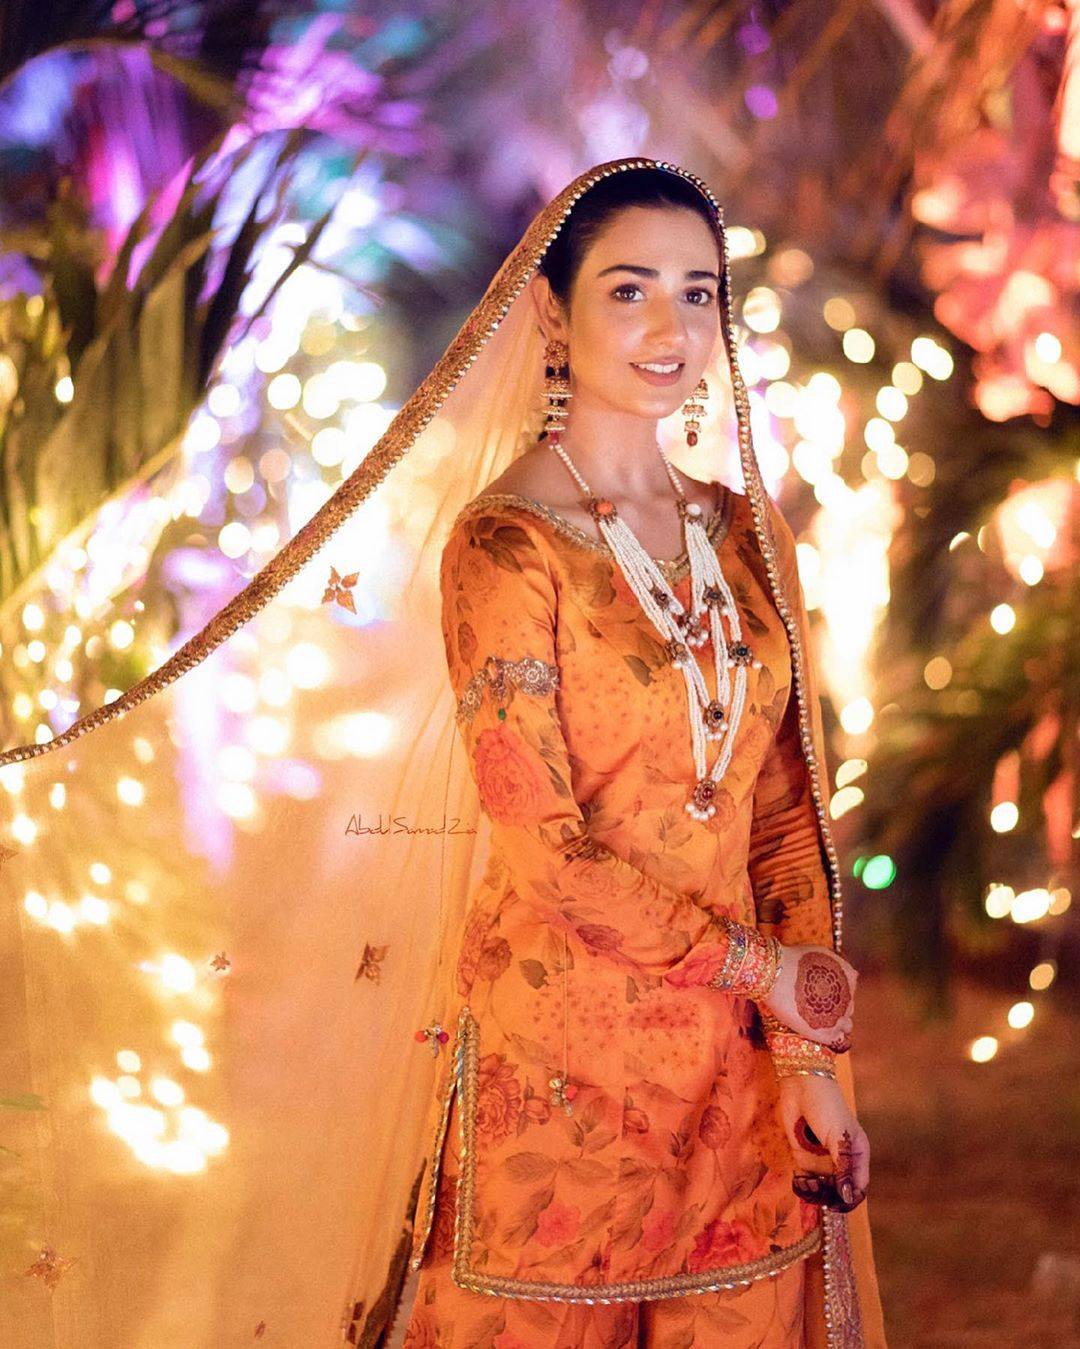 Sarah Khan and Falak Shabbir New Clicks from their Mehndi